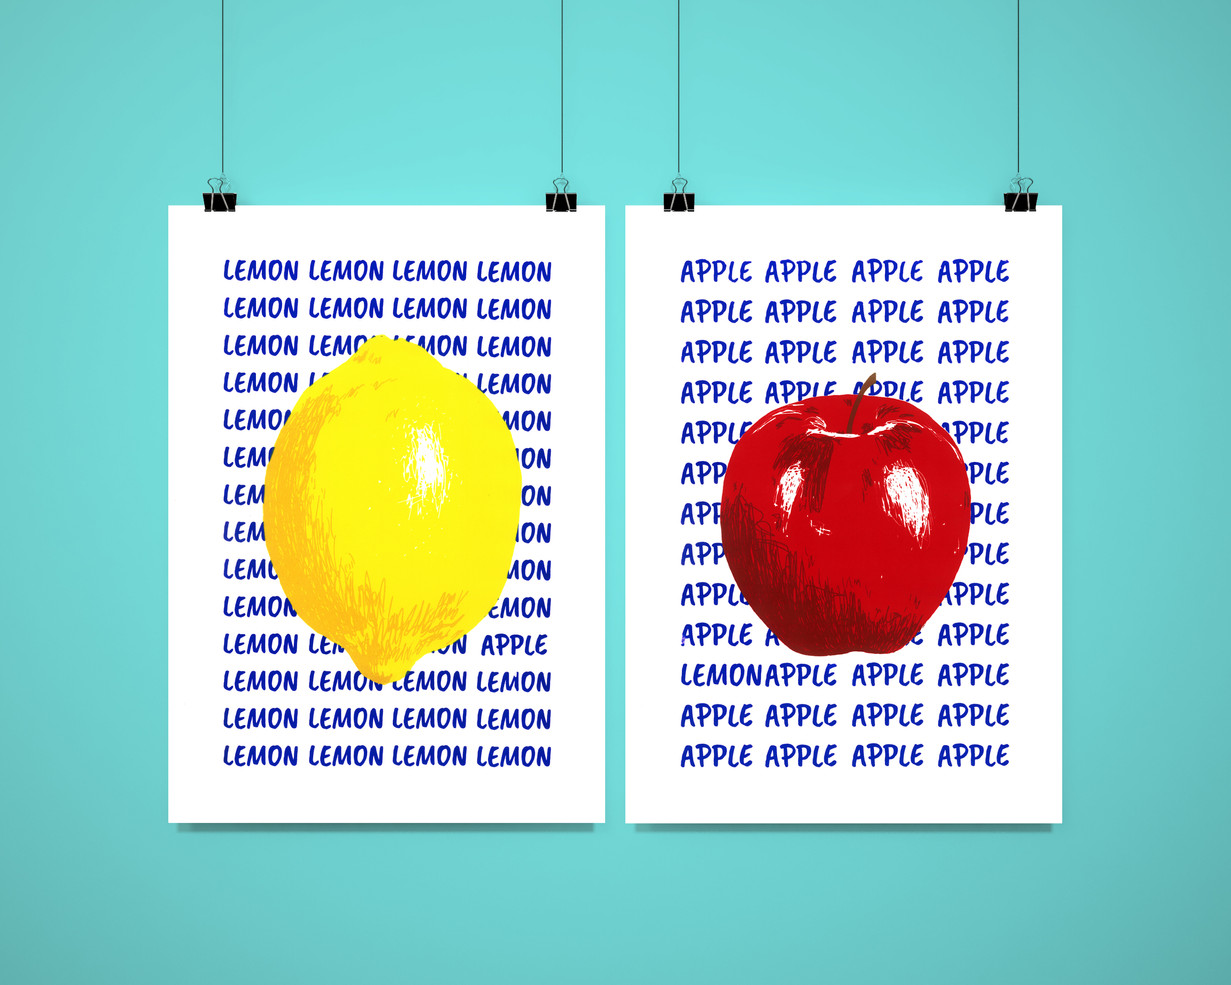 lemon apple mounted.jpg